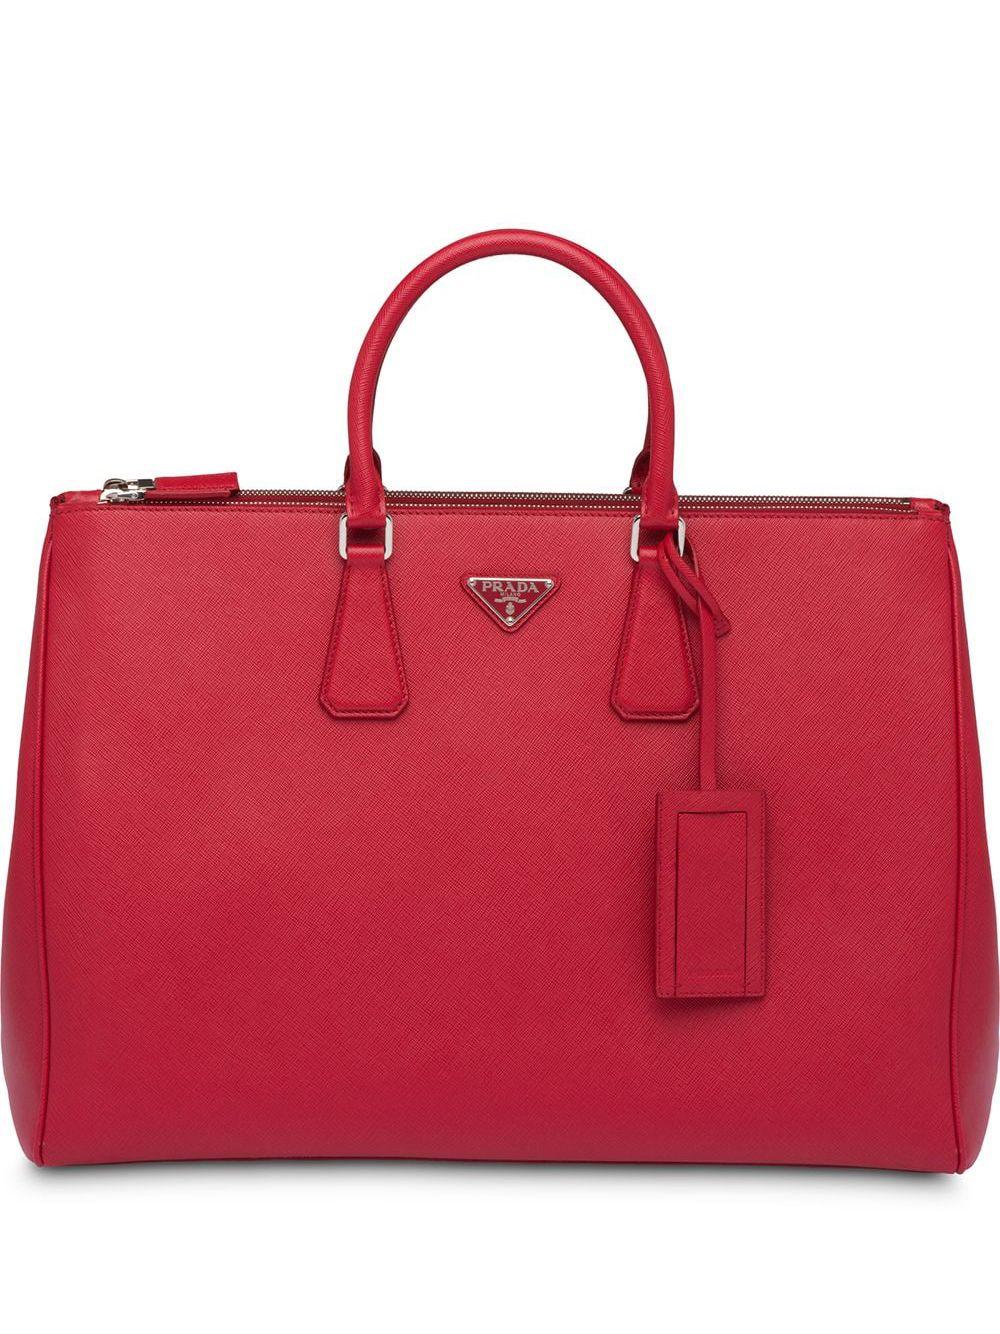 Prada Aktentasche aus Saffiano-Leder - Rot